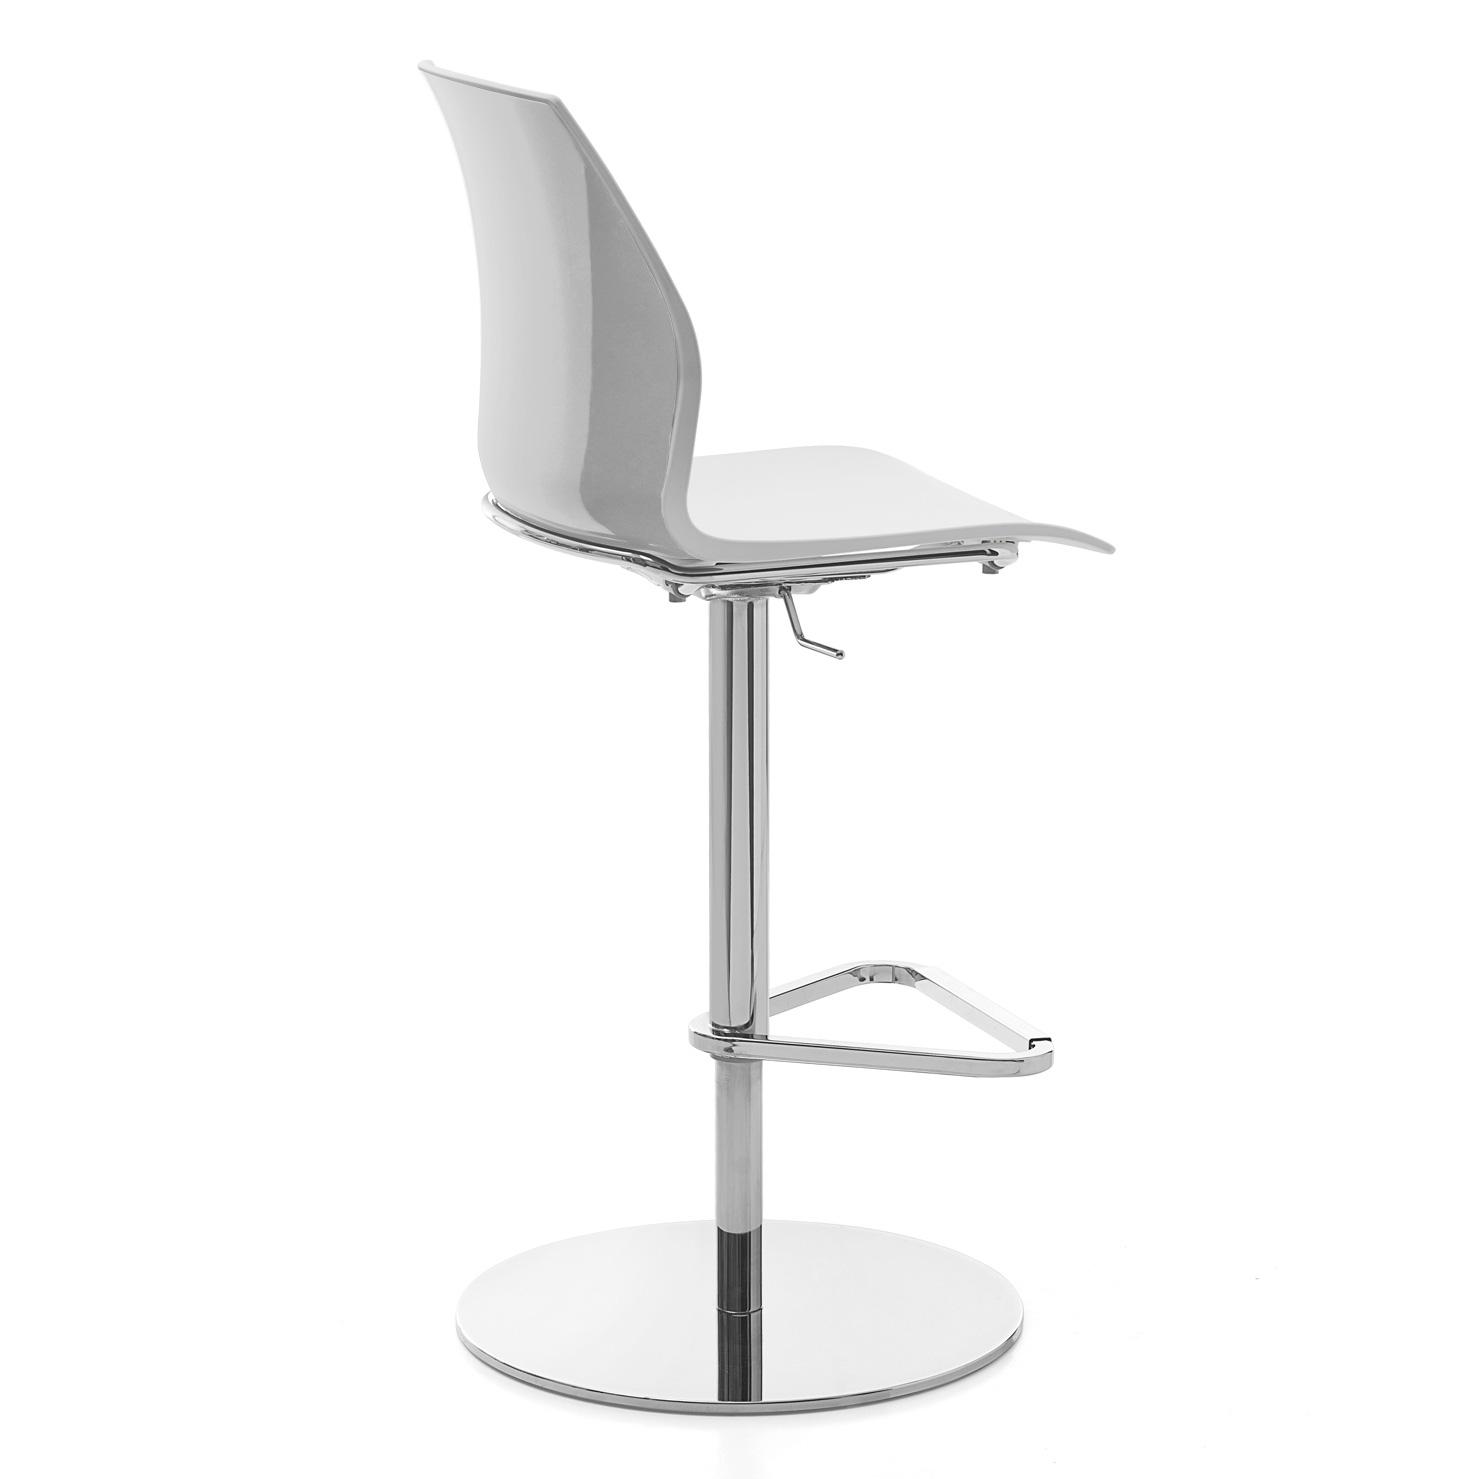 sunpan urban stools pdx stool unity bowen furniture wayfair modern bar reviews adjustable